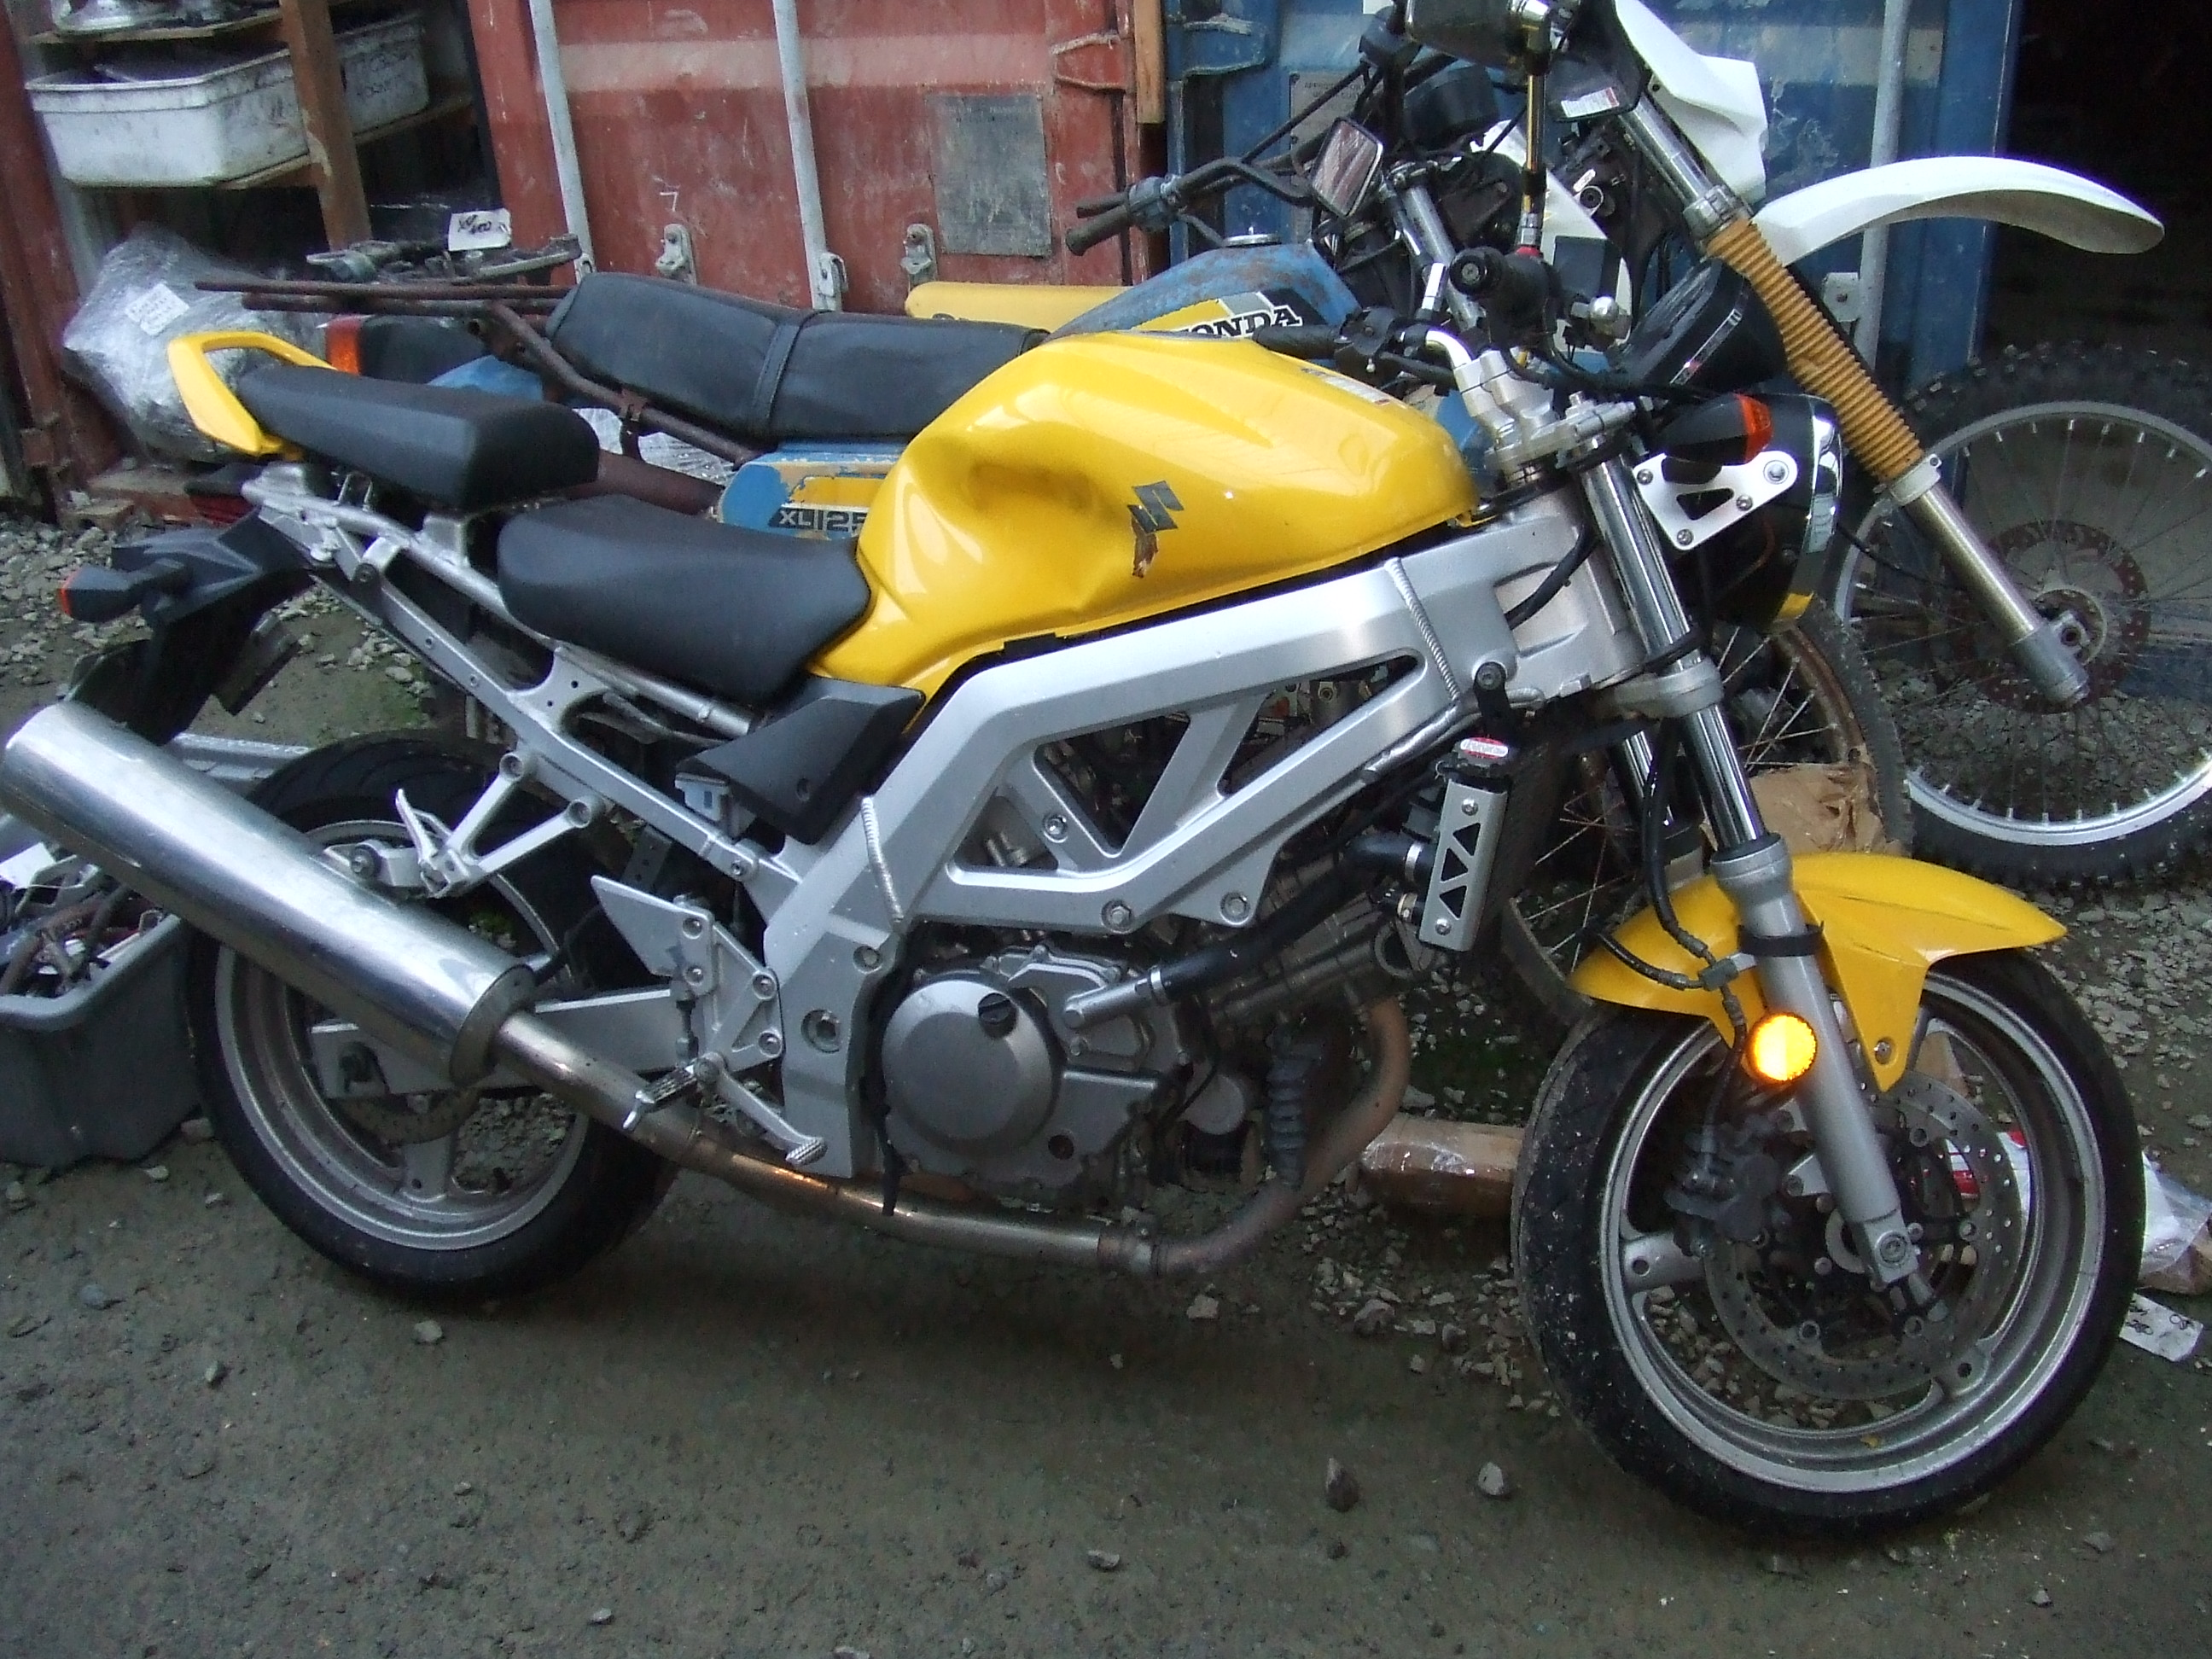 Suzuki Bike Parts - Motorcycle Wreckers, pre-owned bike parts